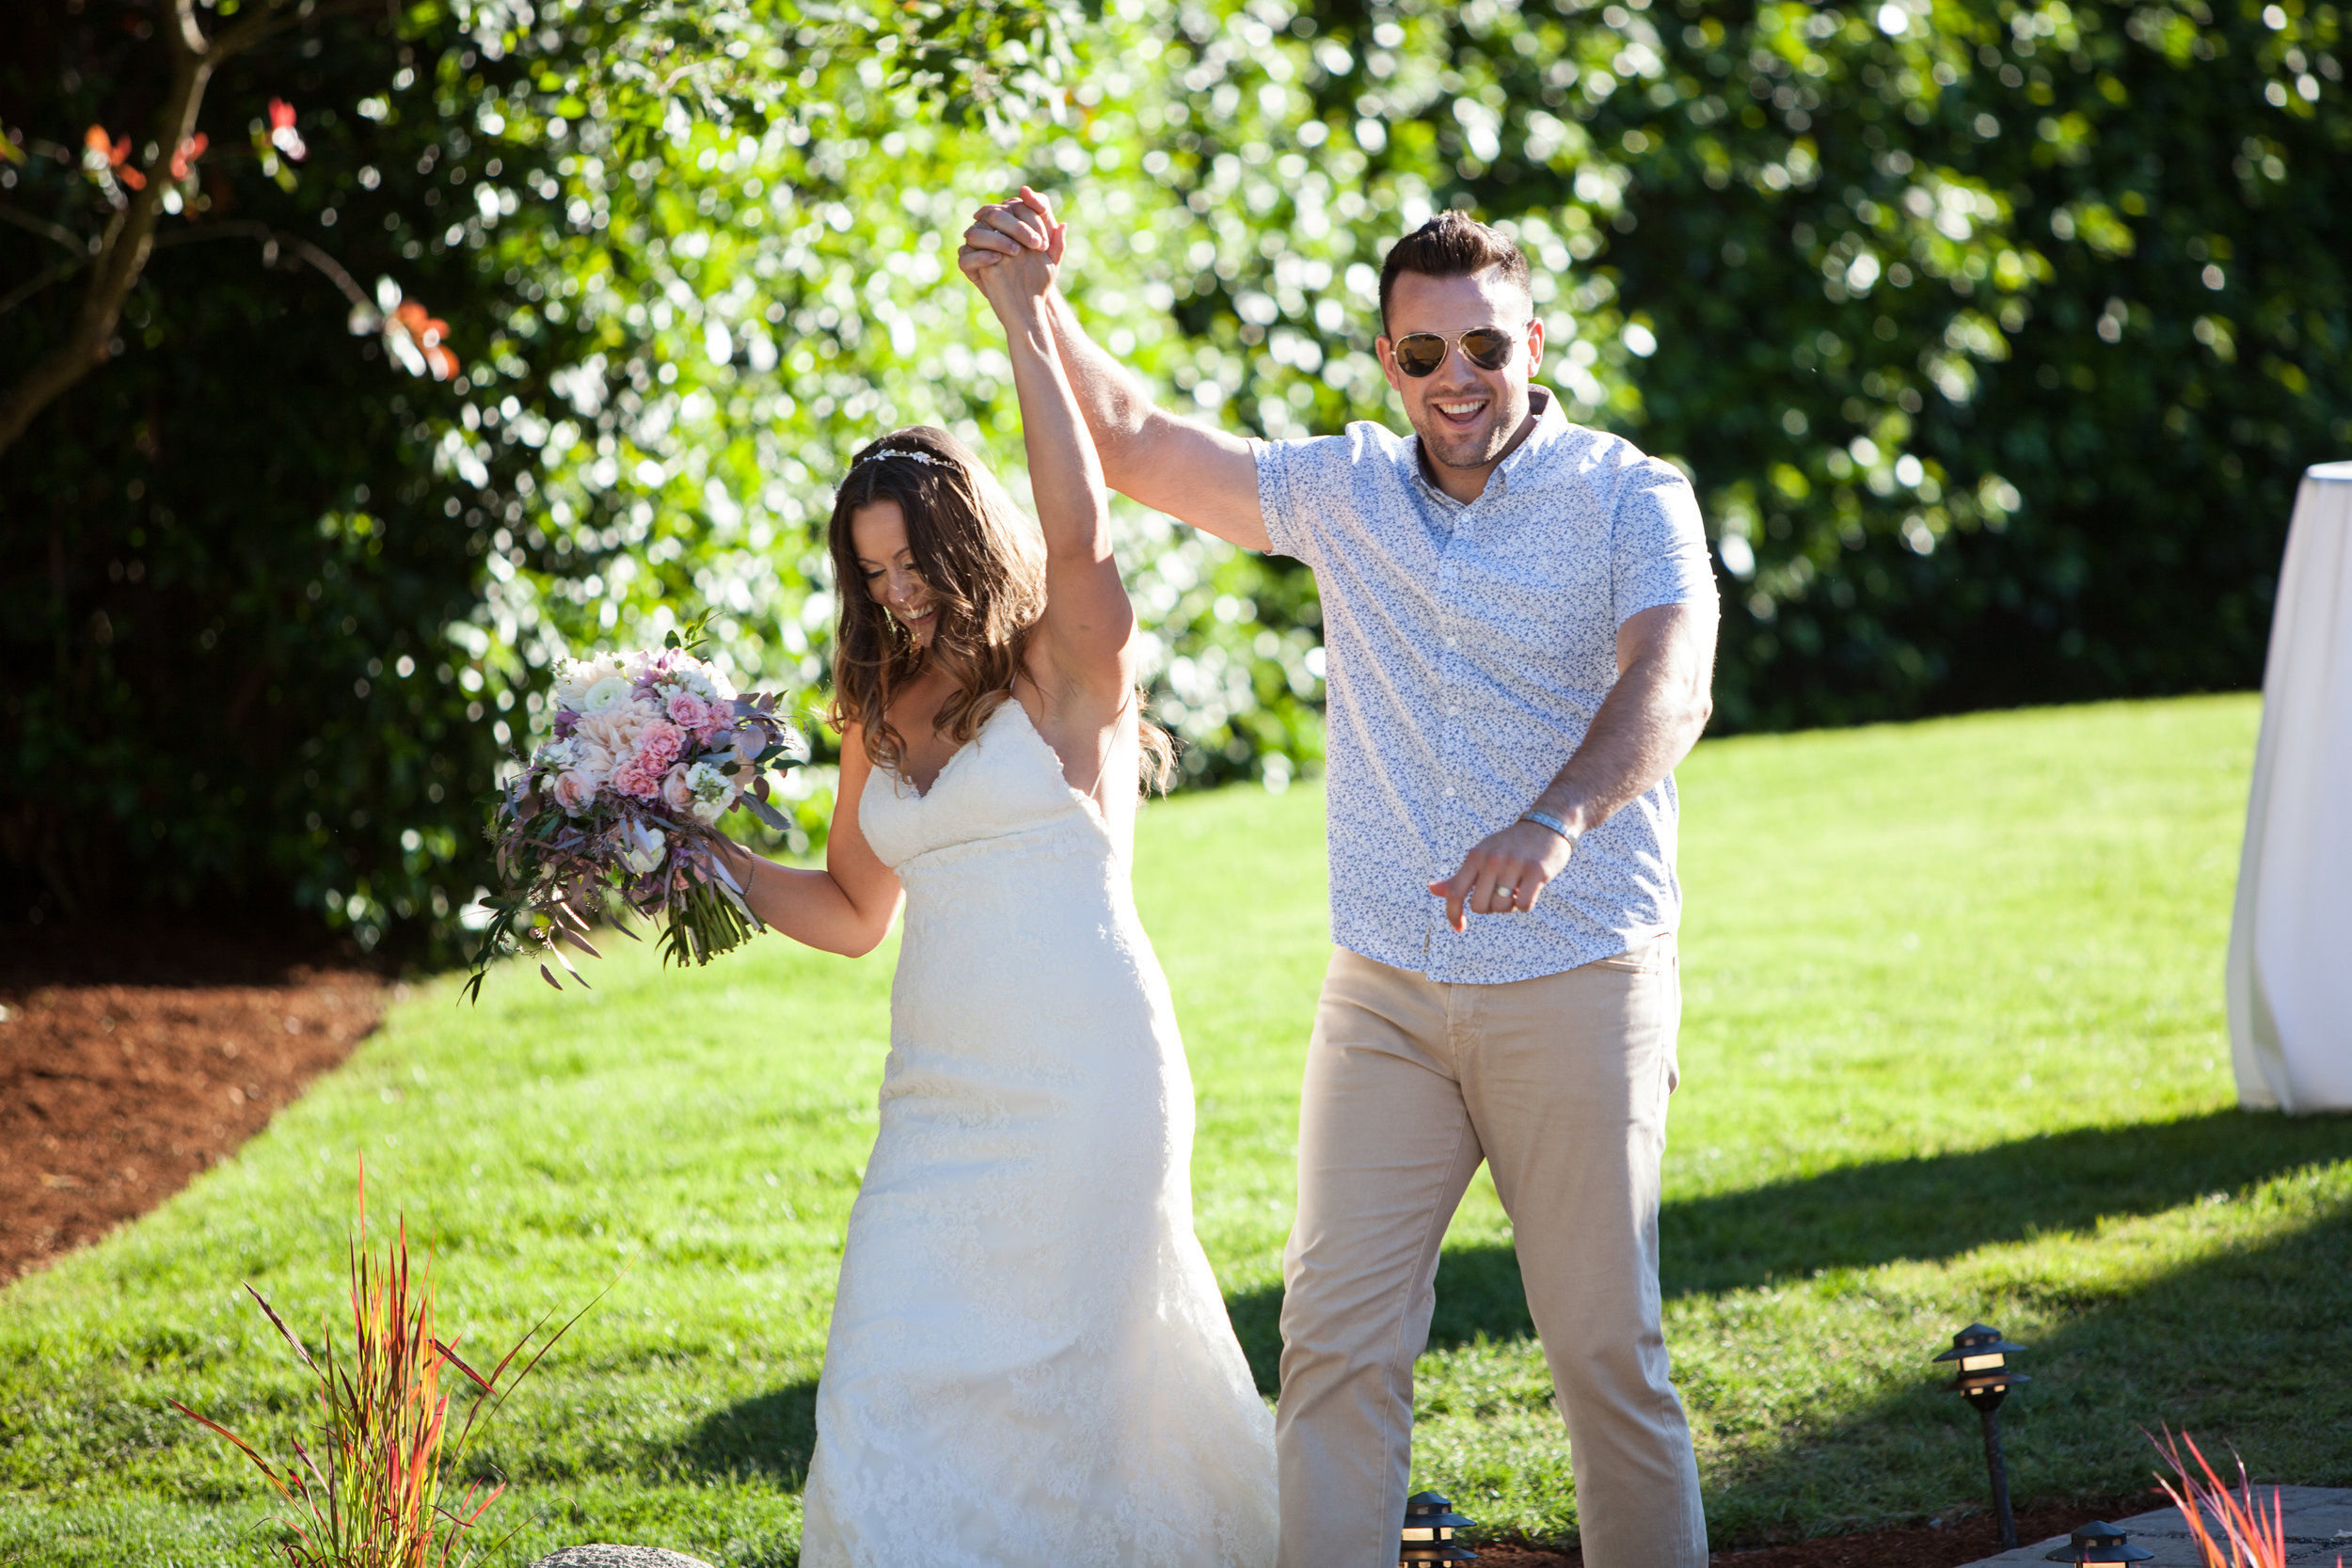 sandstrom_wedding_639.jpg